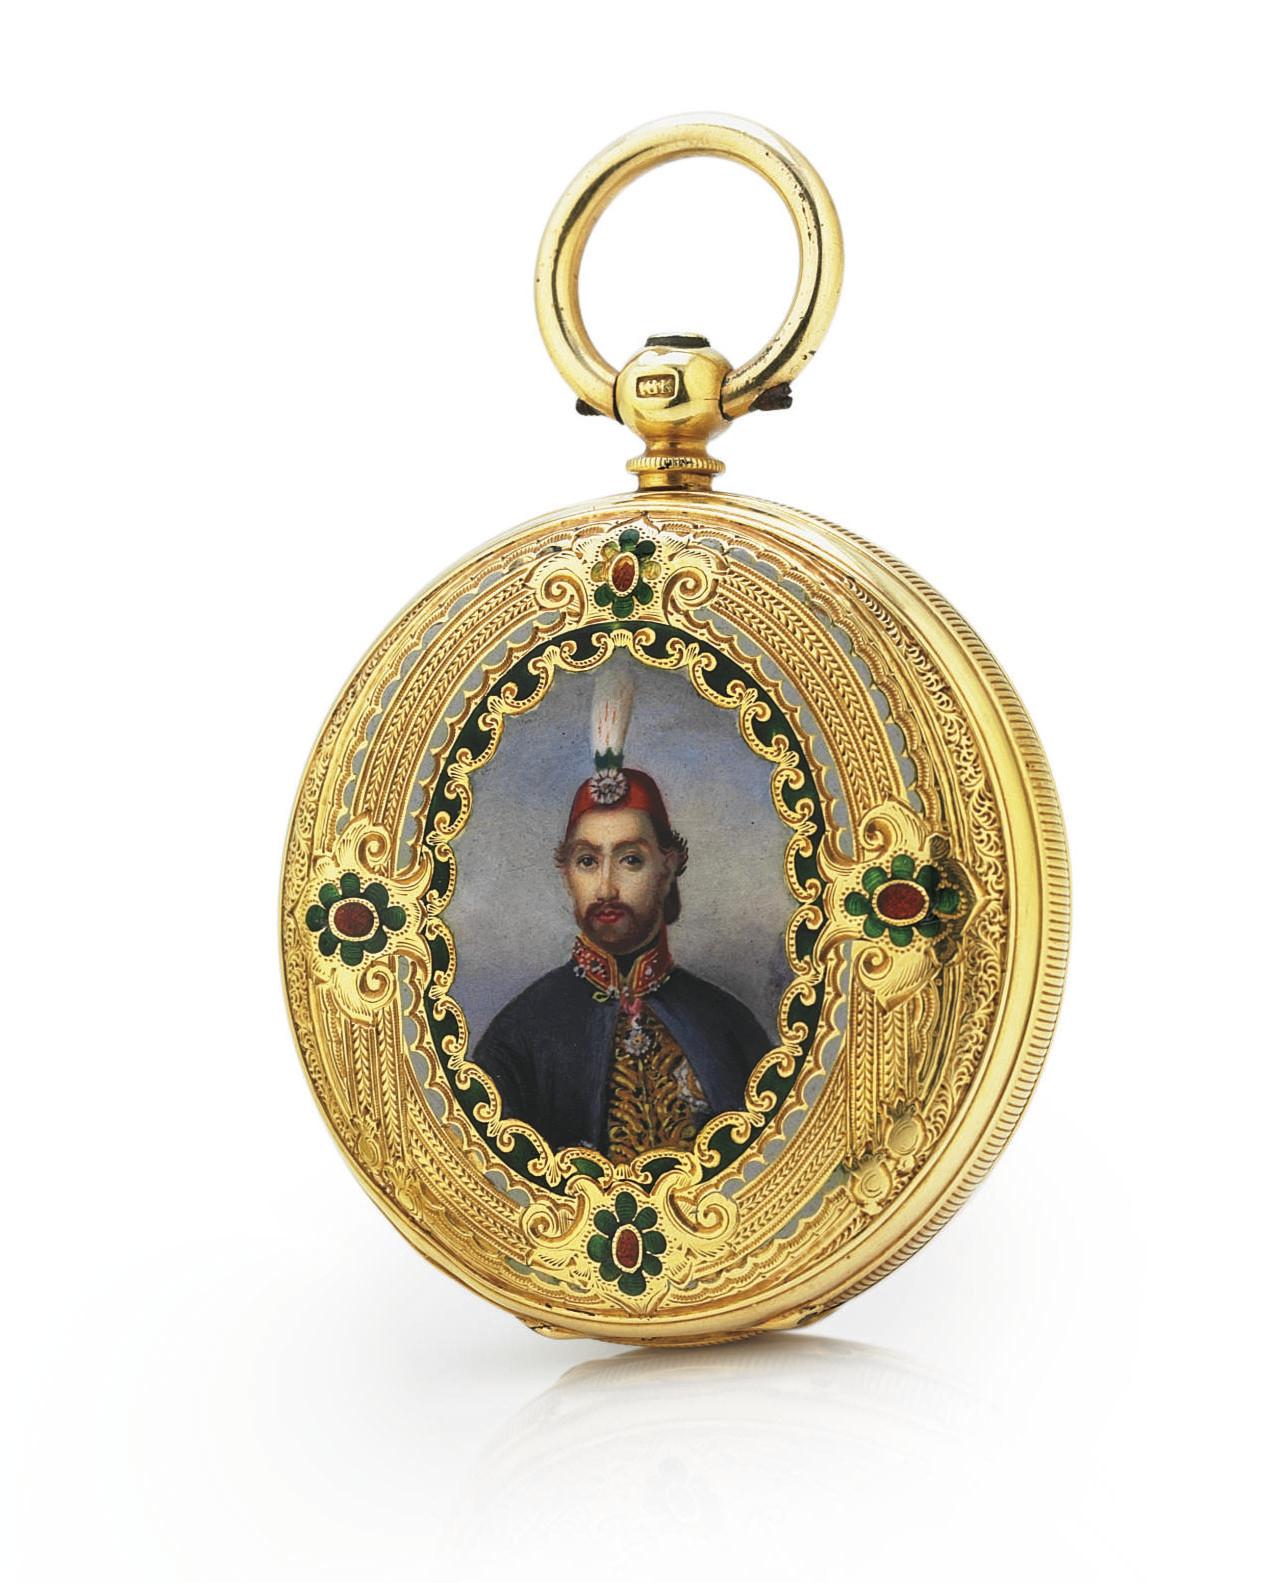 FRENCH.  AN 18K GOLD AND ENAMEL HUNTER CASE KEYWIND POCKET CHRONOMETER